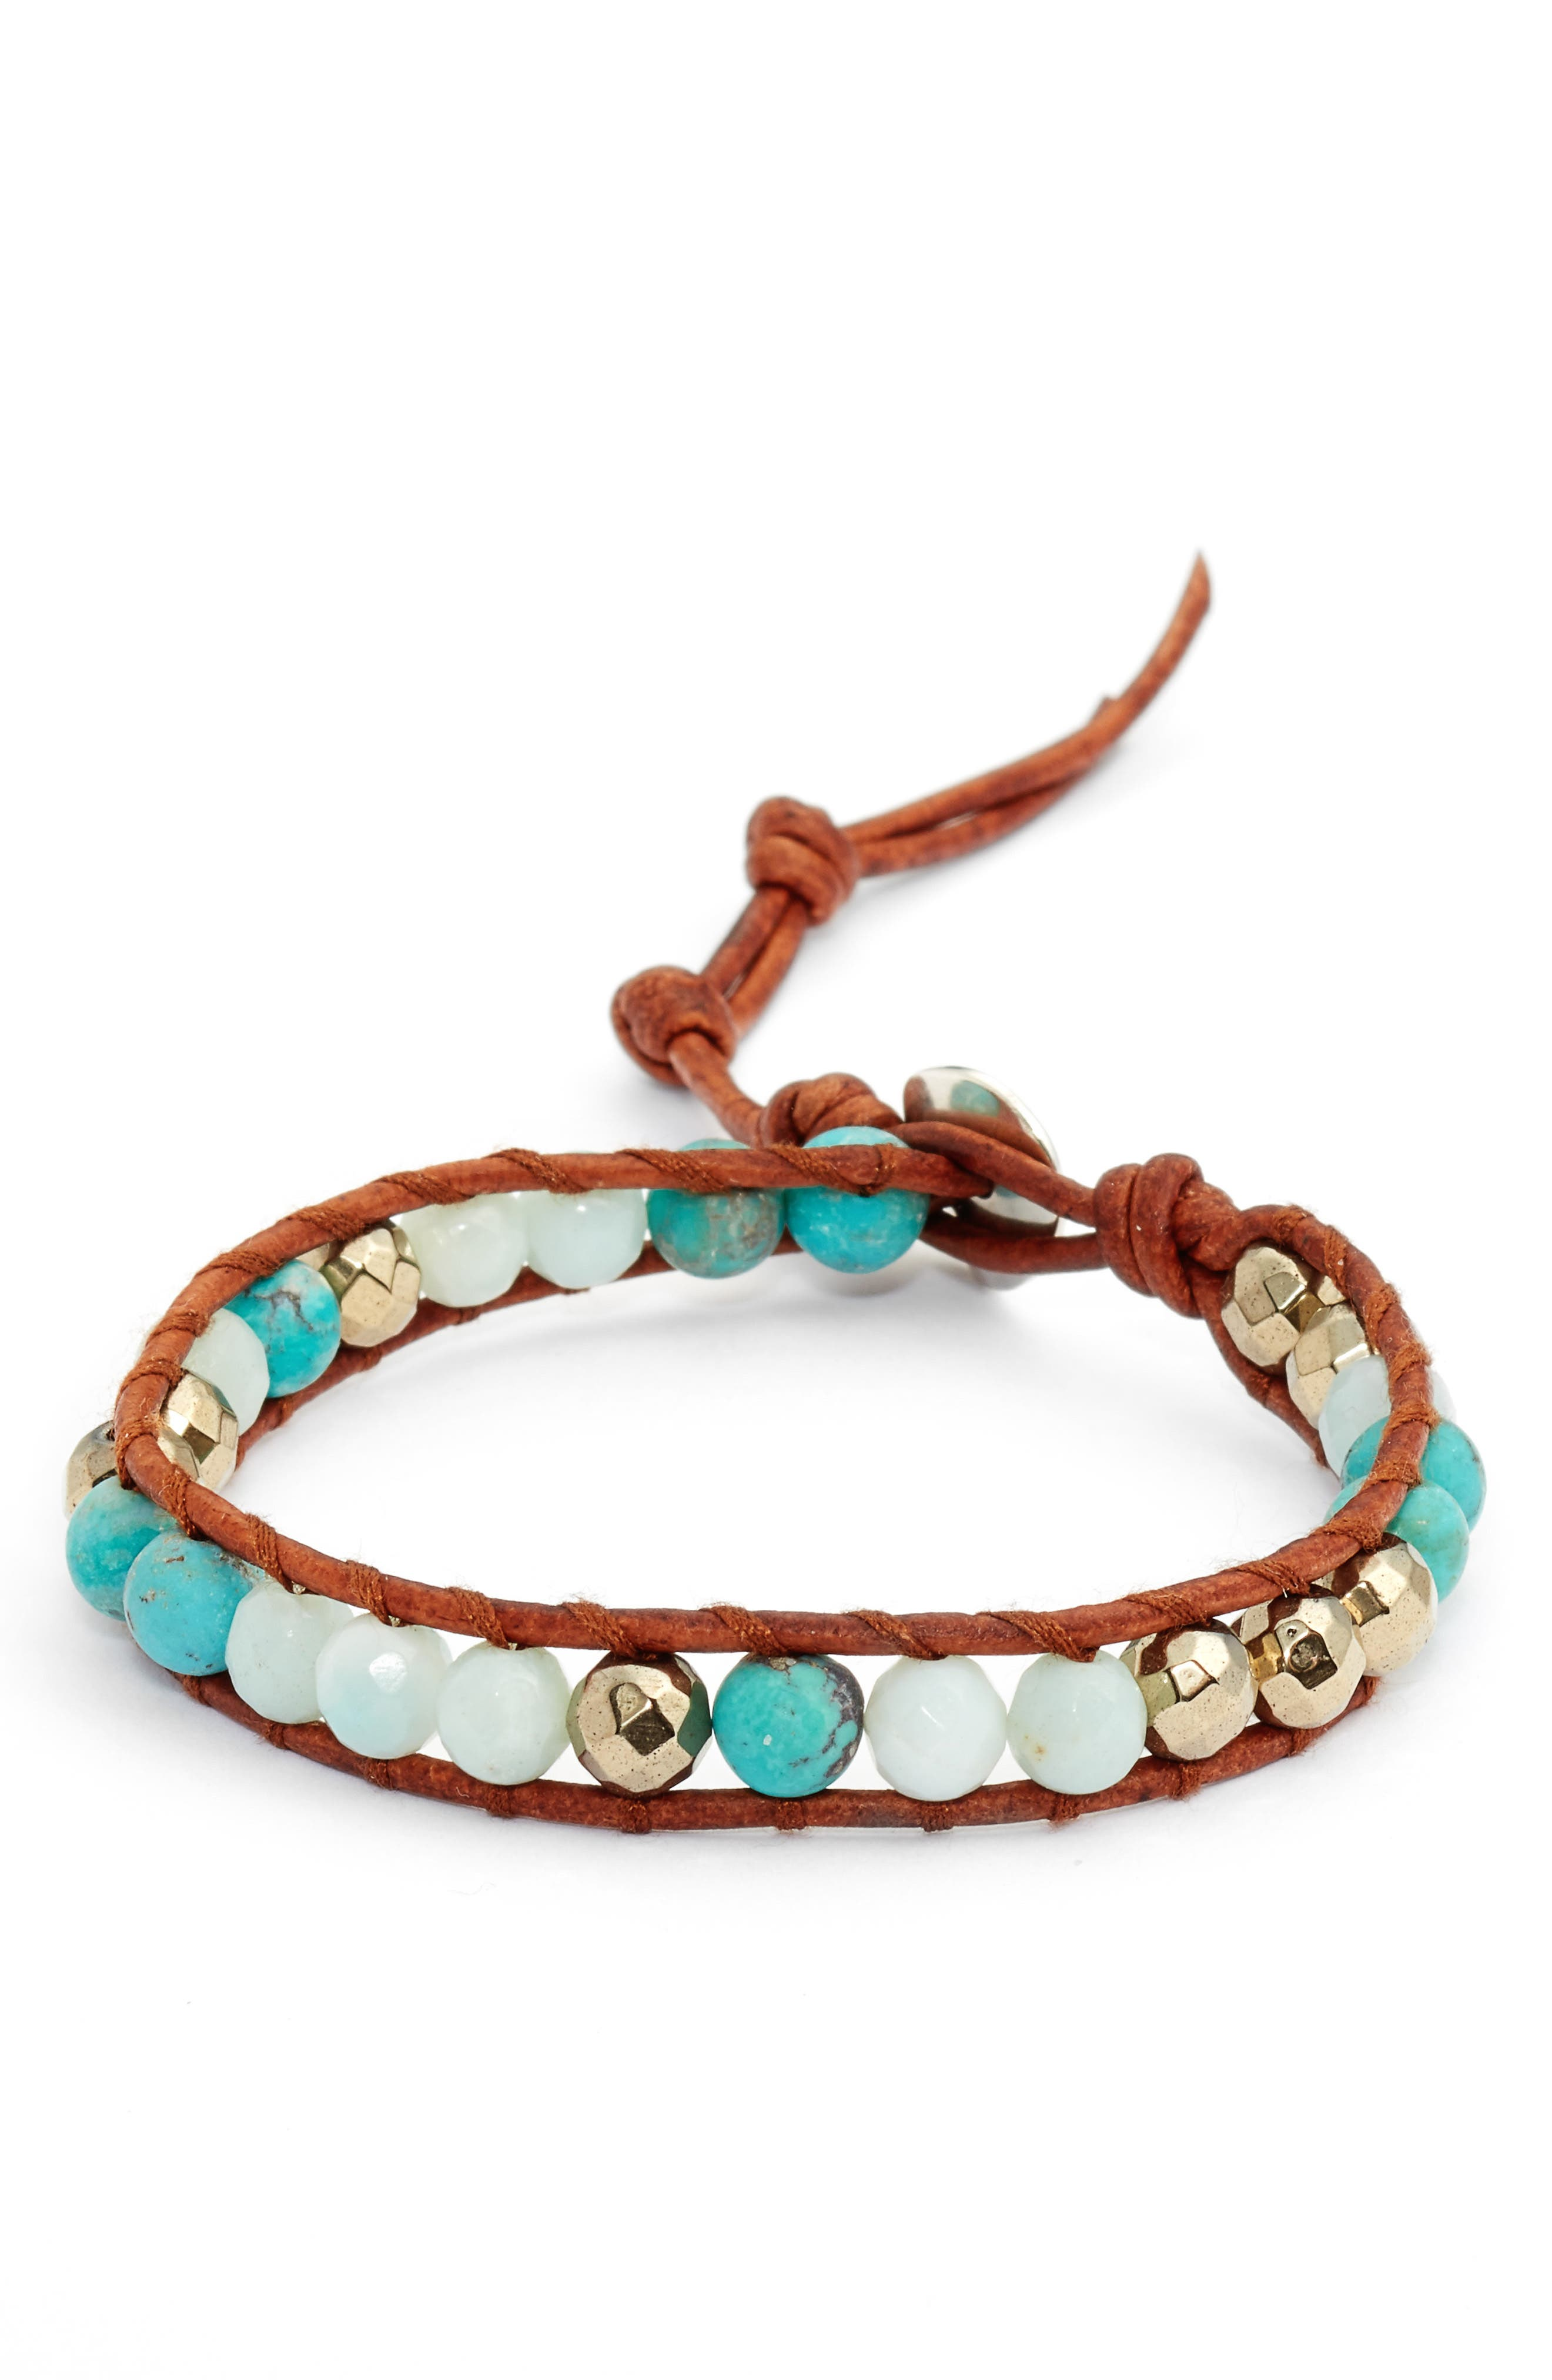 Mixed Semiprecious Stone Bracelet,                         Main,                         color, Turquoise Mix